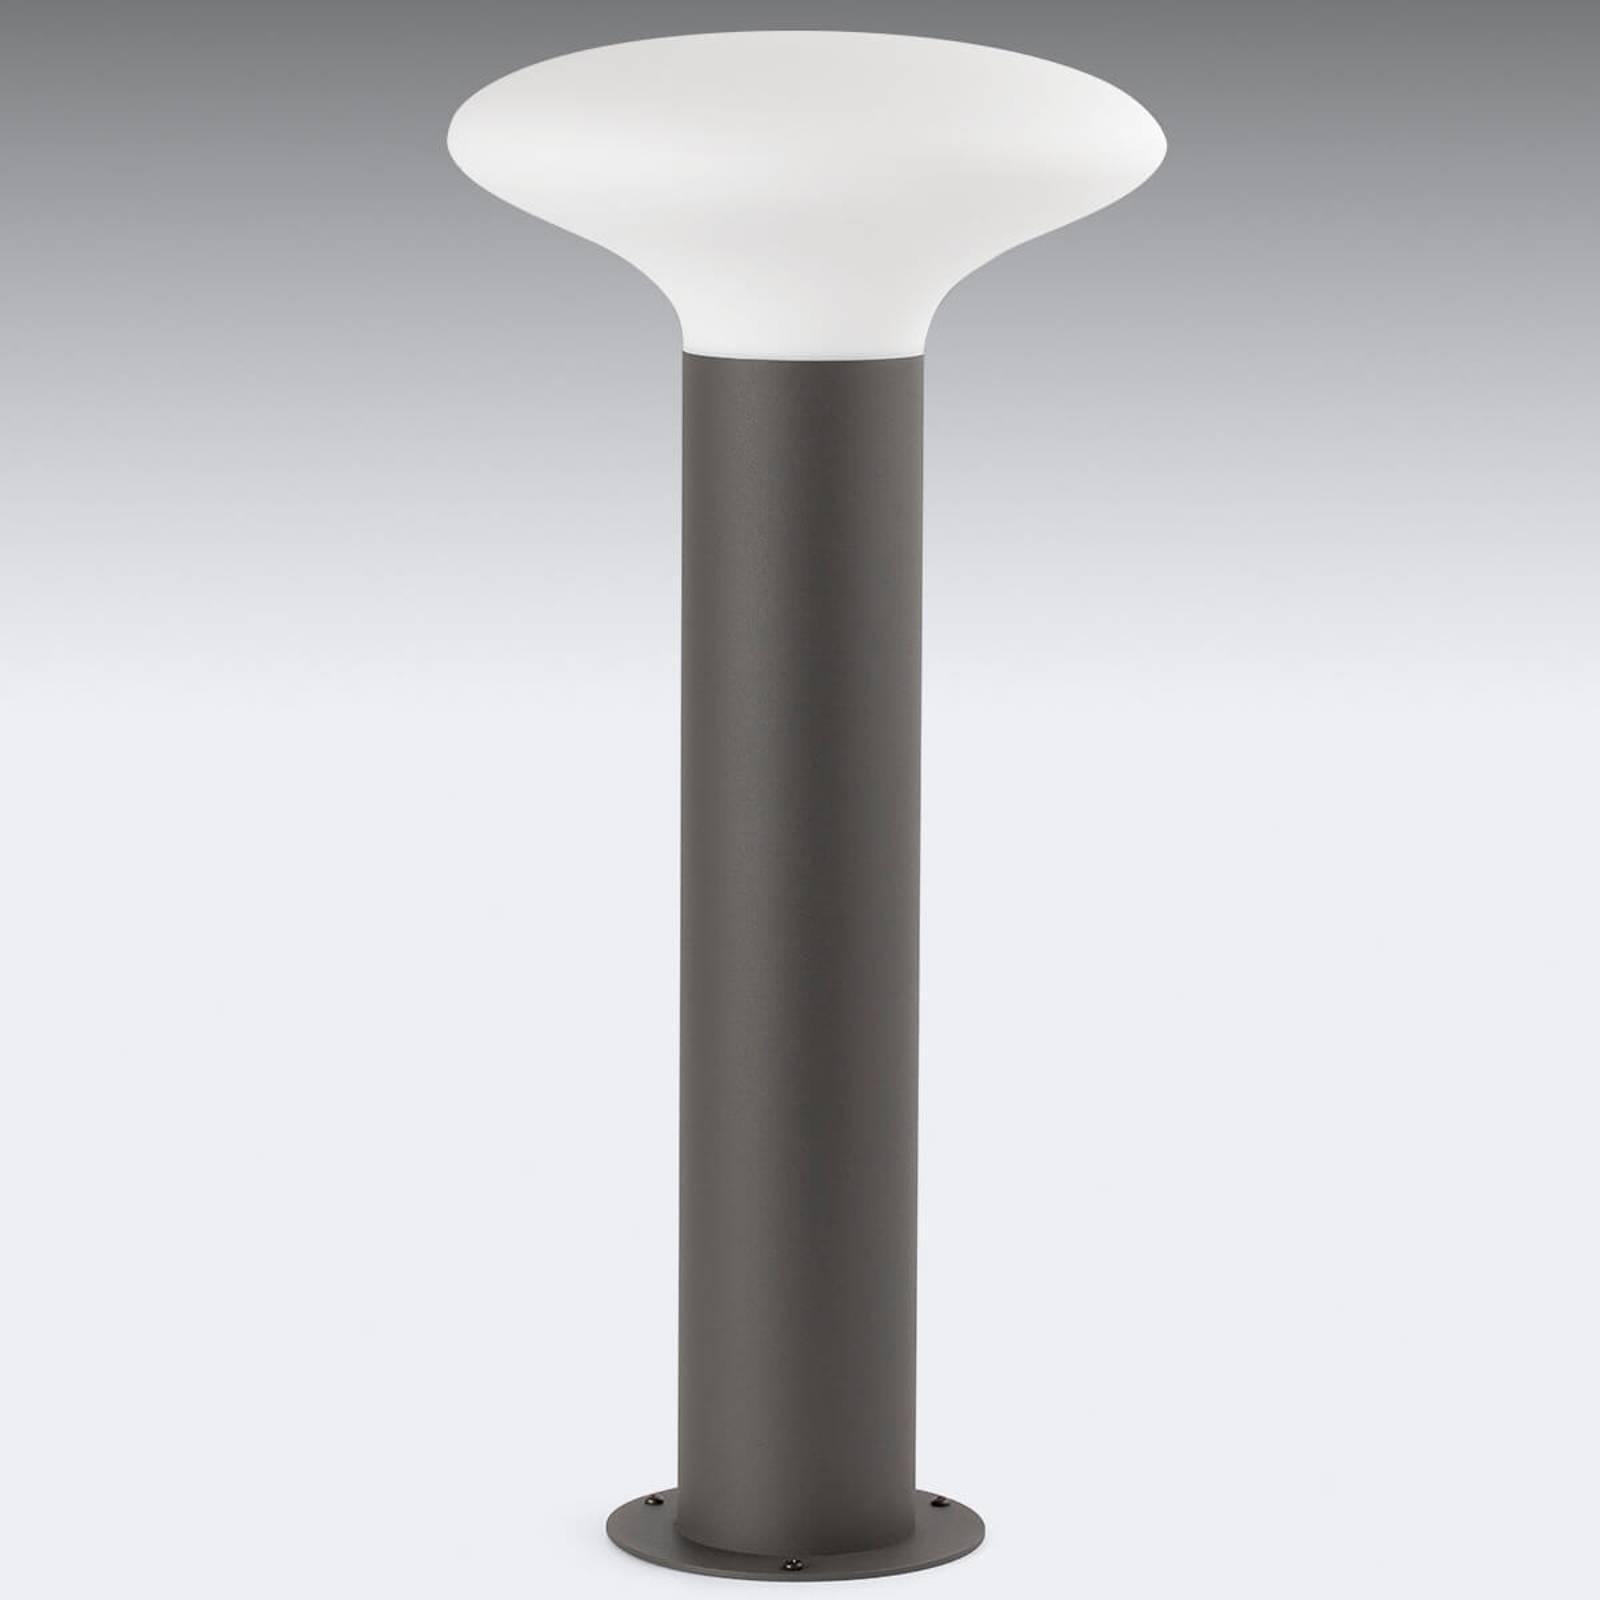 LED-pollarivalaisin Blub's, 54 cm